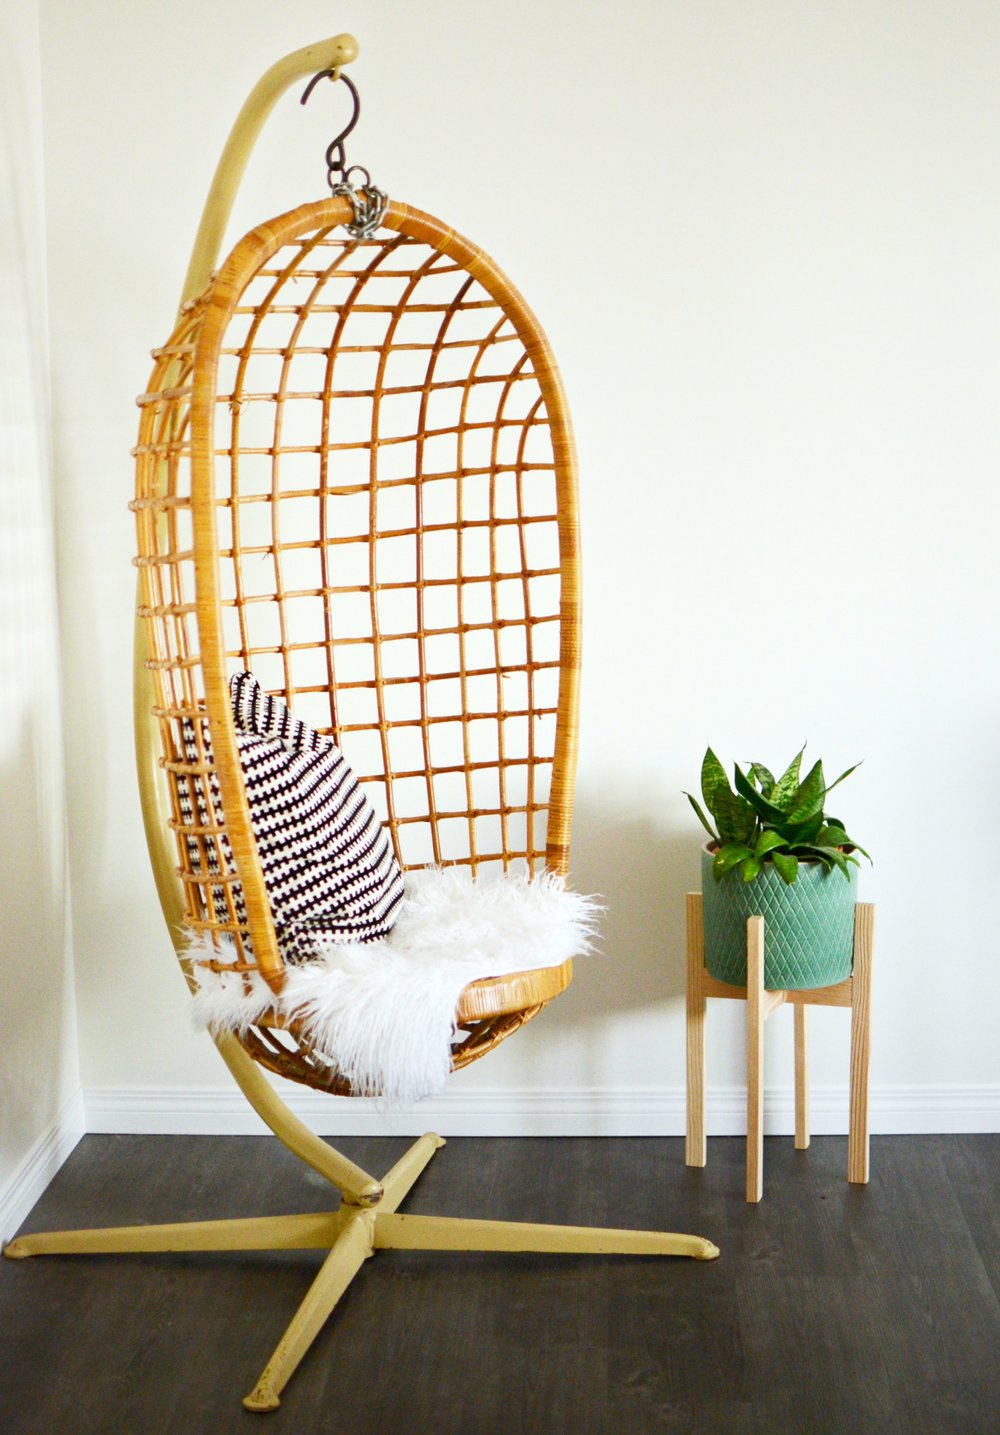 calgary-interior-designer-bedroom-decor-21.jpg